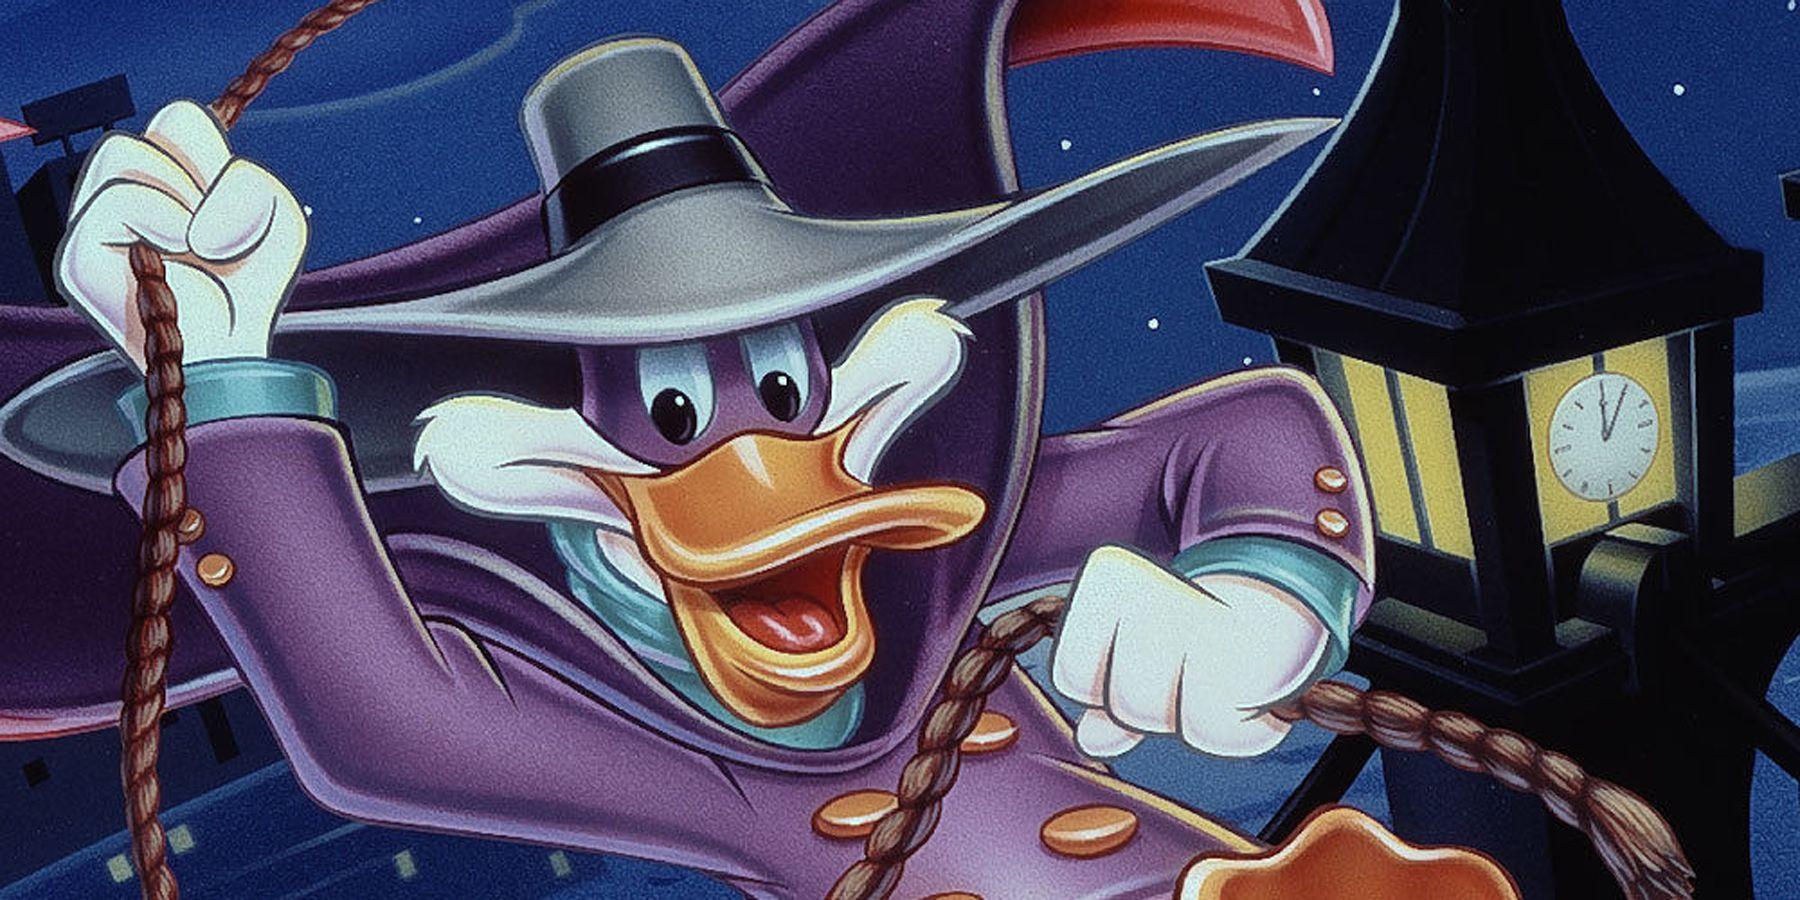 25 Years Later, Darkwing Duck is Still a Little Dangerous